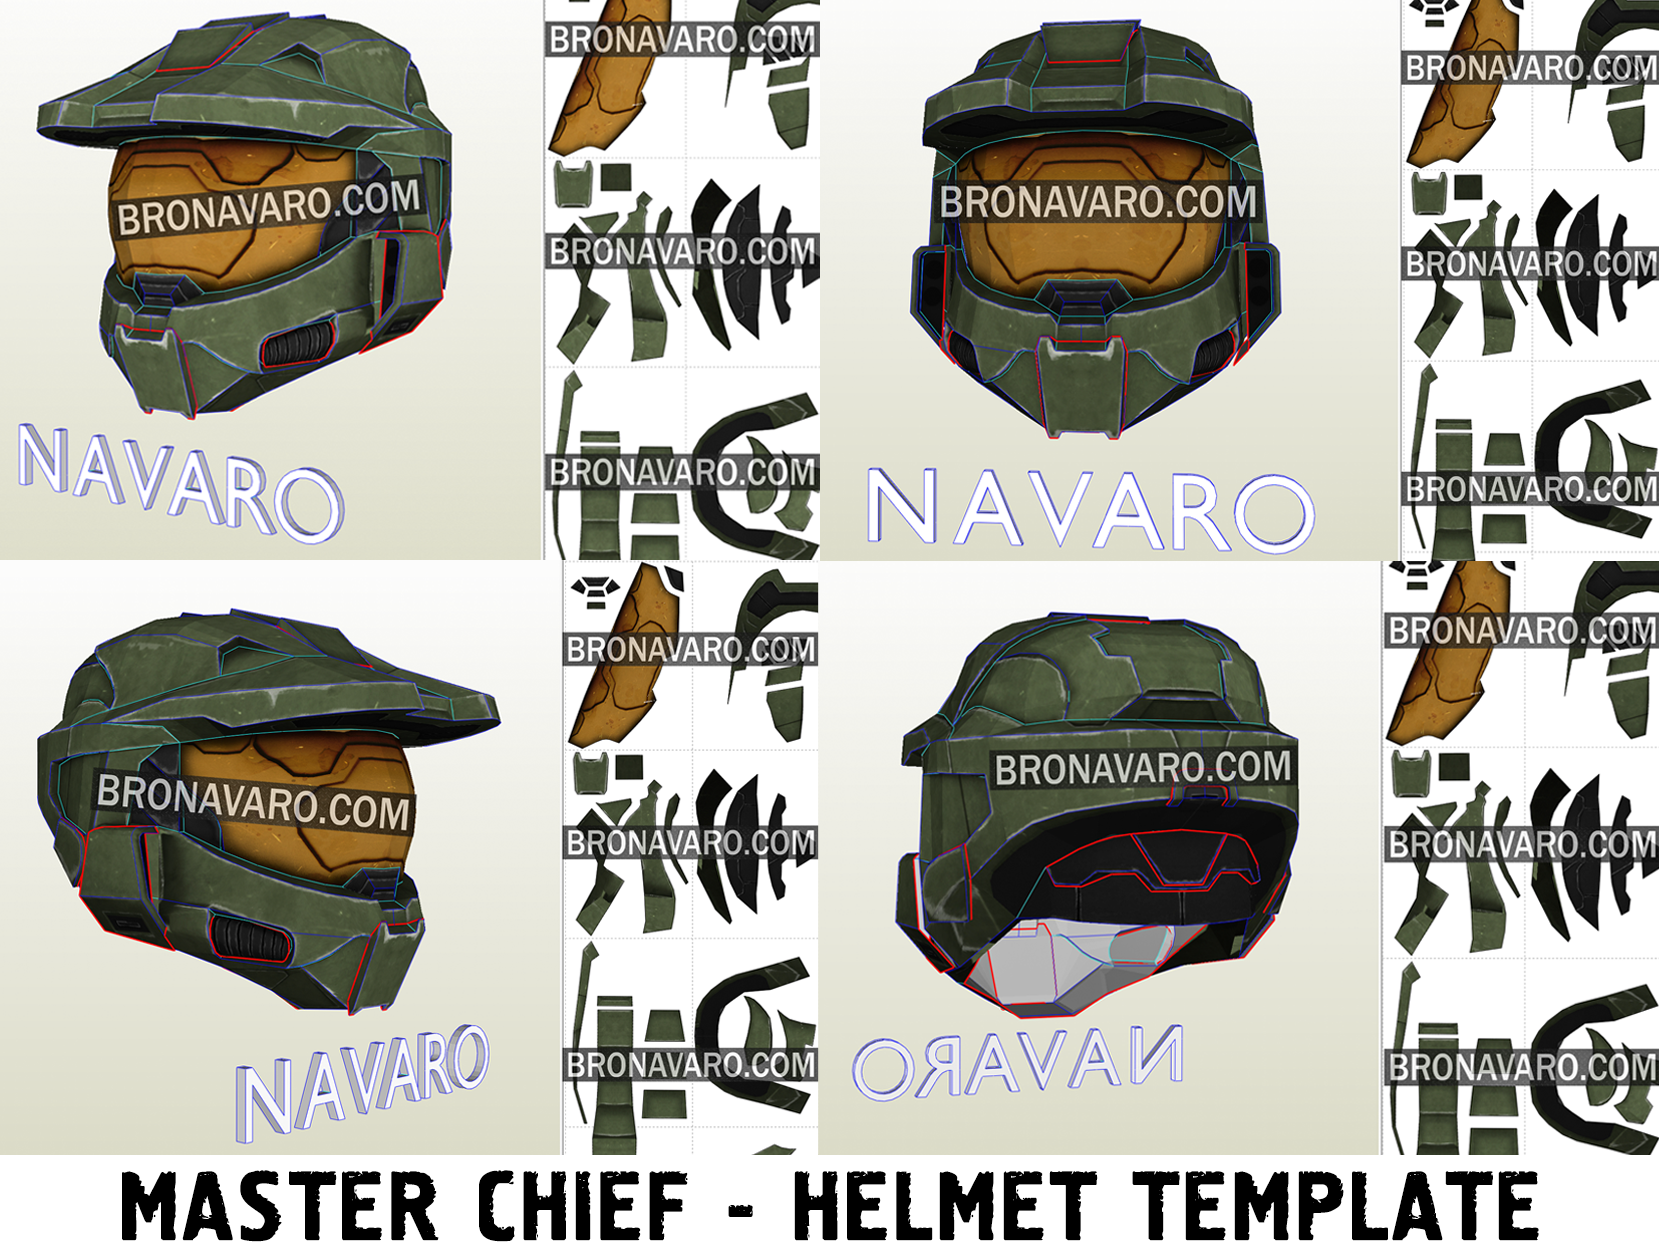 Master Chief Helmet Foam Template Halo 3 Cosplay Helmet Master Chief Helmet Pattern Halo 3 Helmet Pepakura Master Chief Cosplay Halo Cosplay Helmet